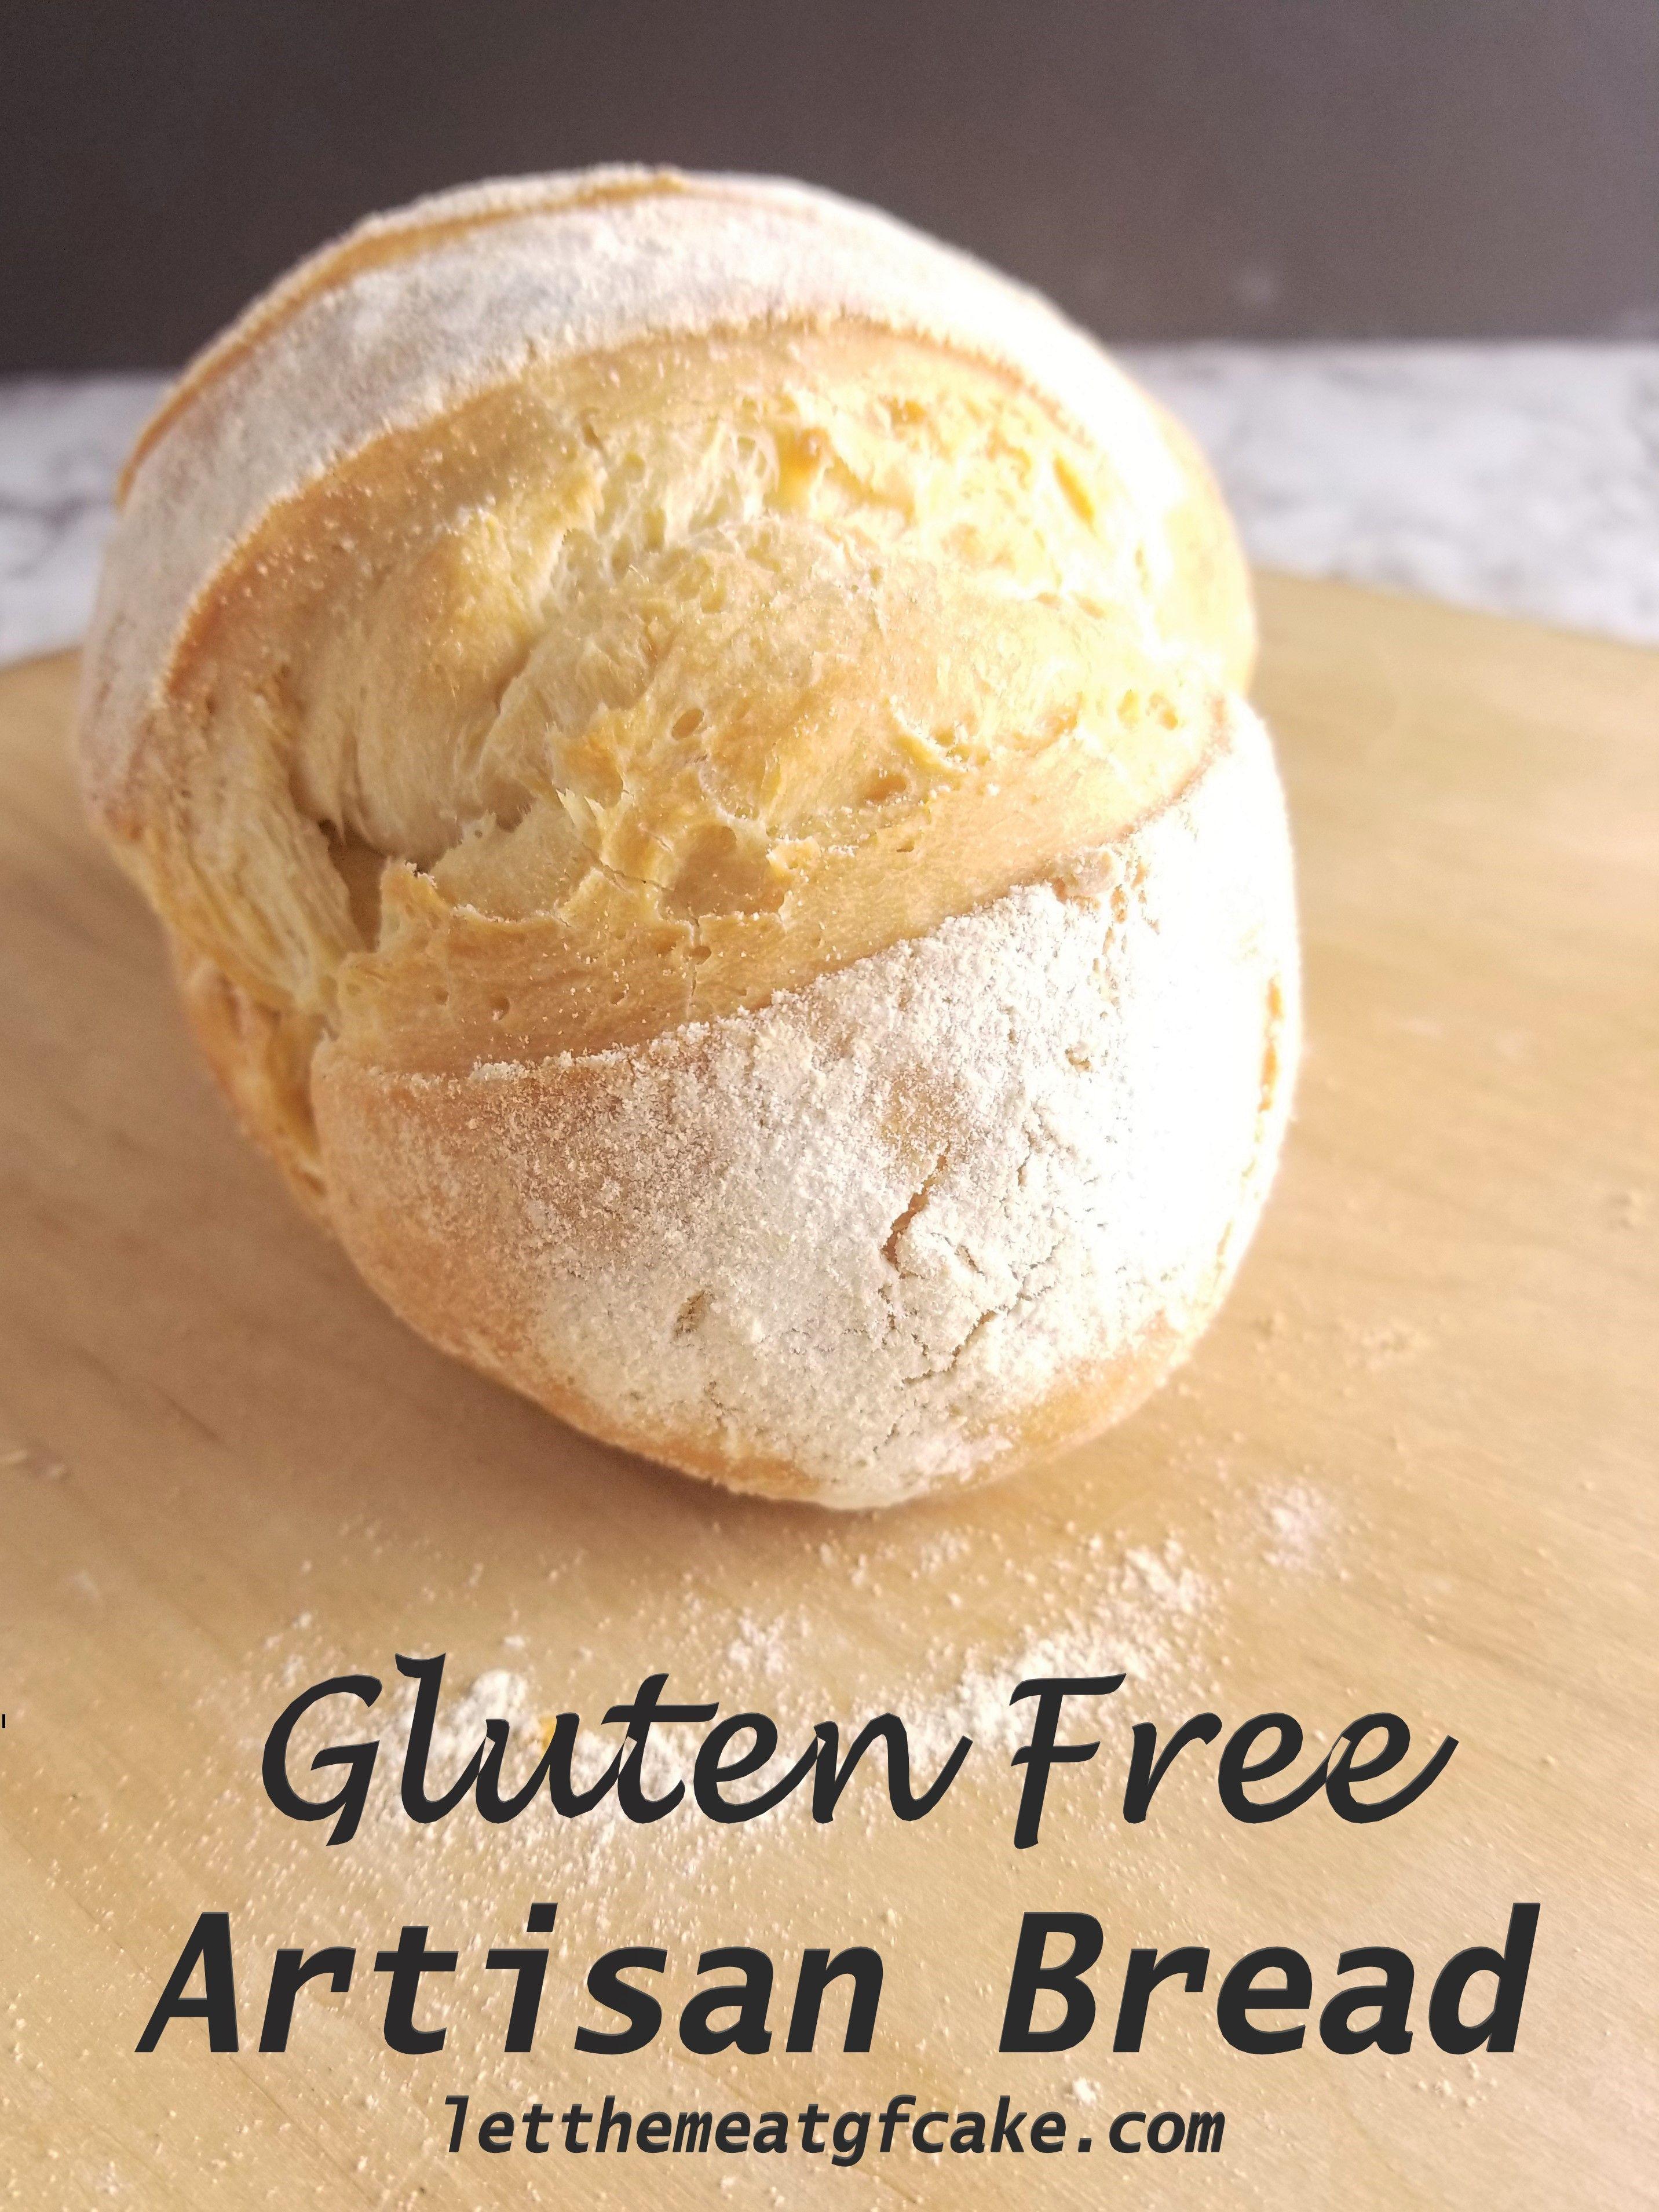 Gluten Free Artisan Bread | Let Them Eat Gluten Fr